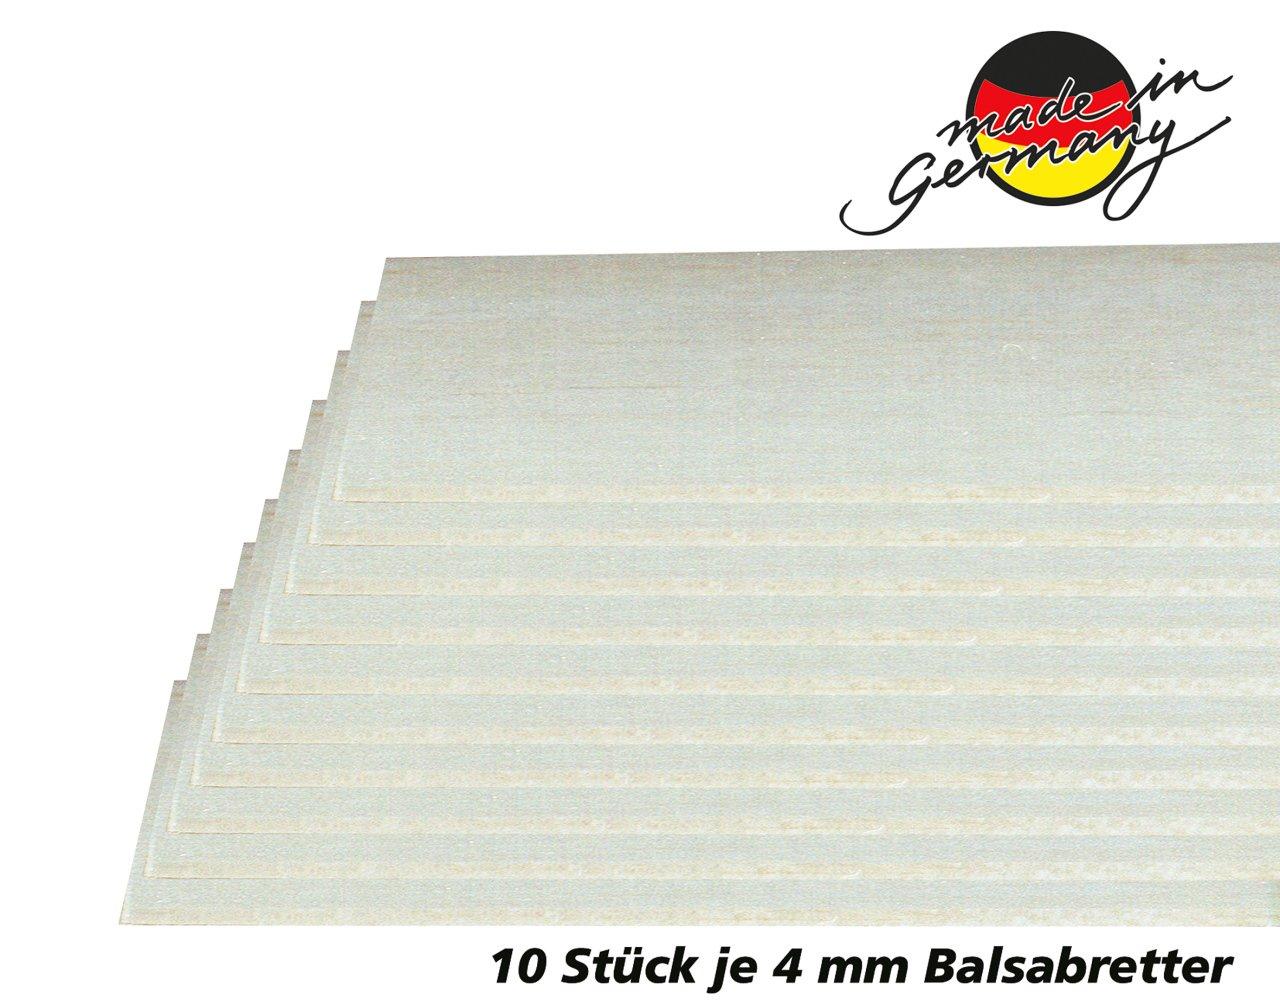 Jamara 231065 Balsa Wood Sheet, Brown, 4 x 100 x 1000 mm